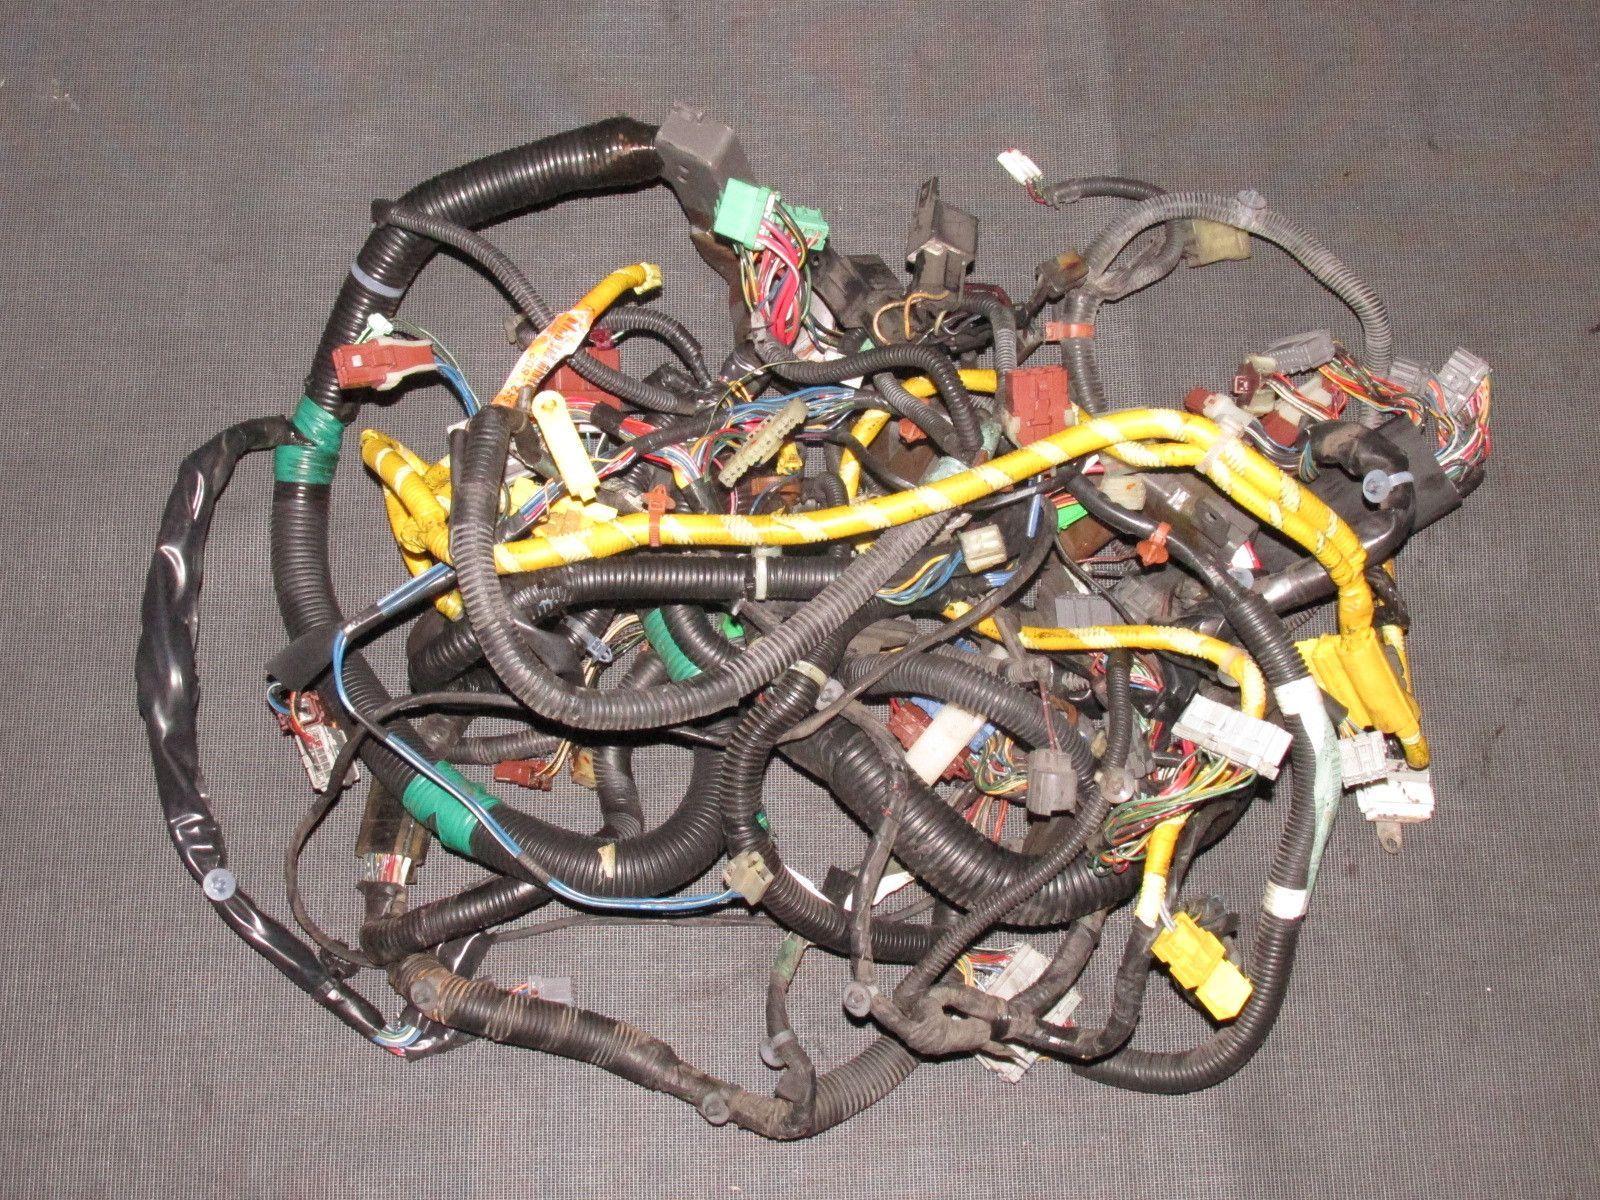 93 94 95 honda del sol oem b16 dash wiring harness [ 1600 x 1200 Pixel ]